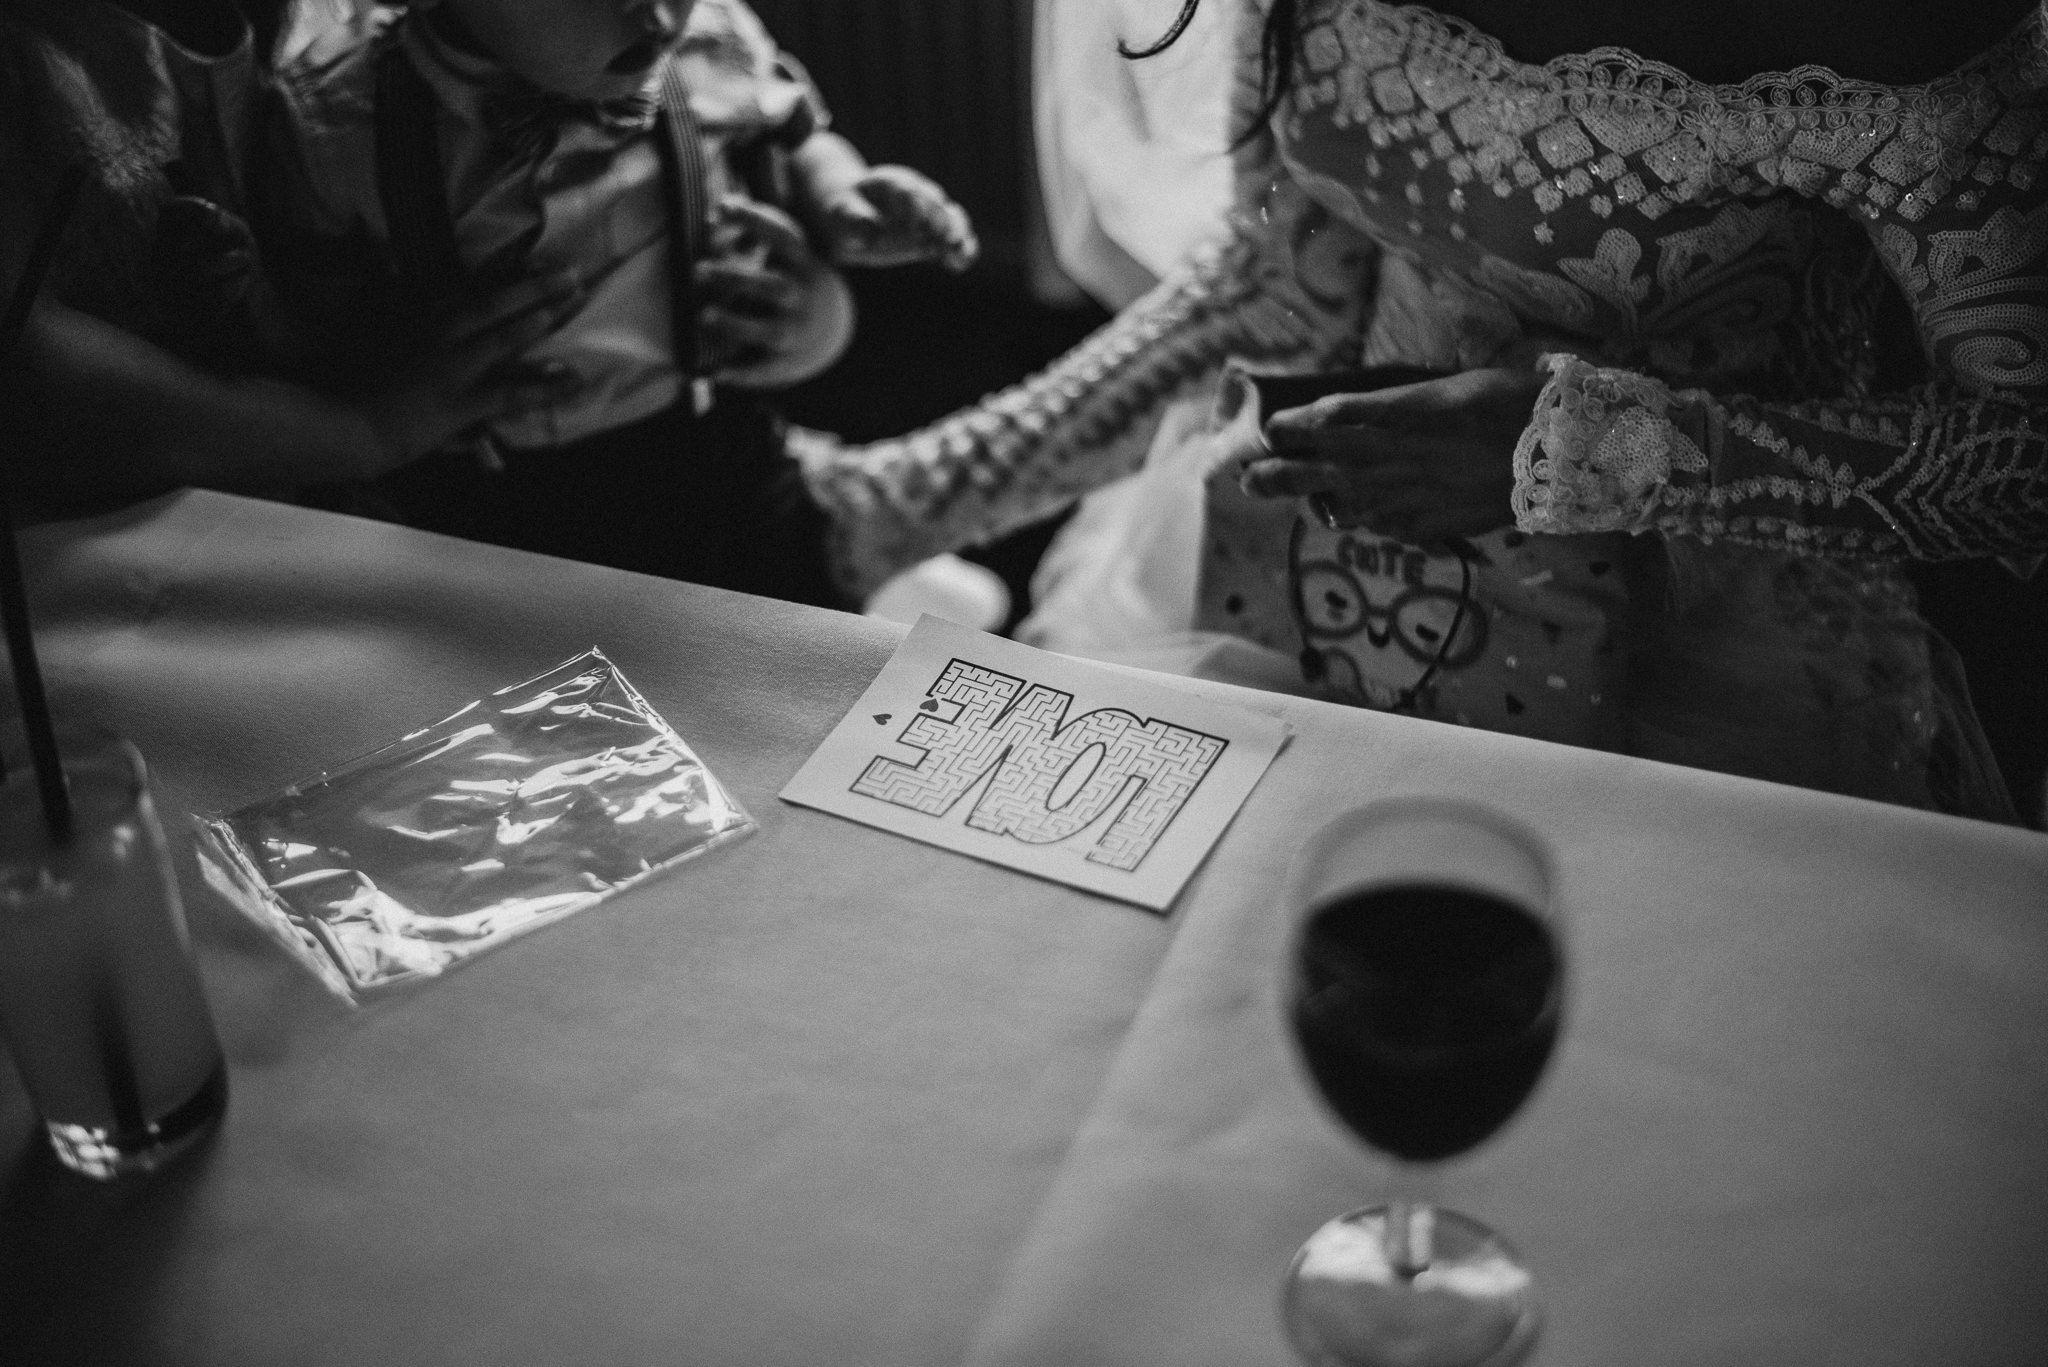 lincolnshire-wedding-photographer-5.jpg